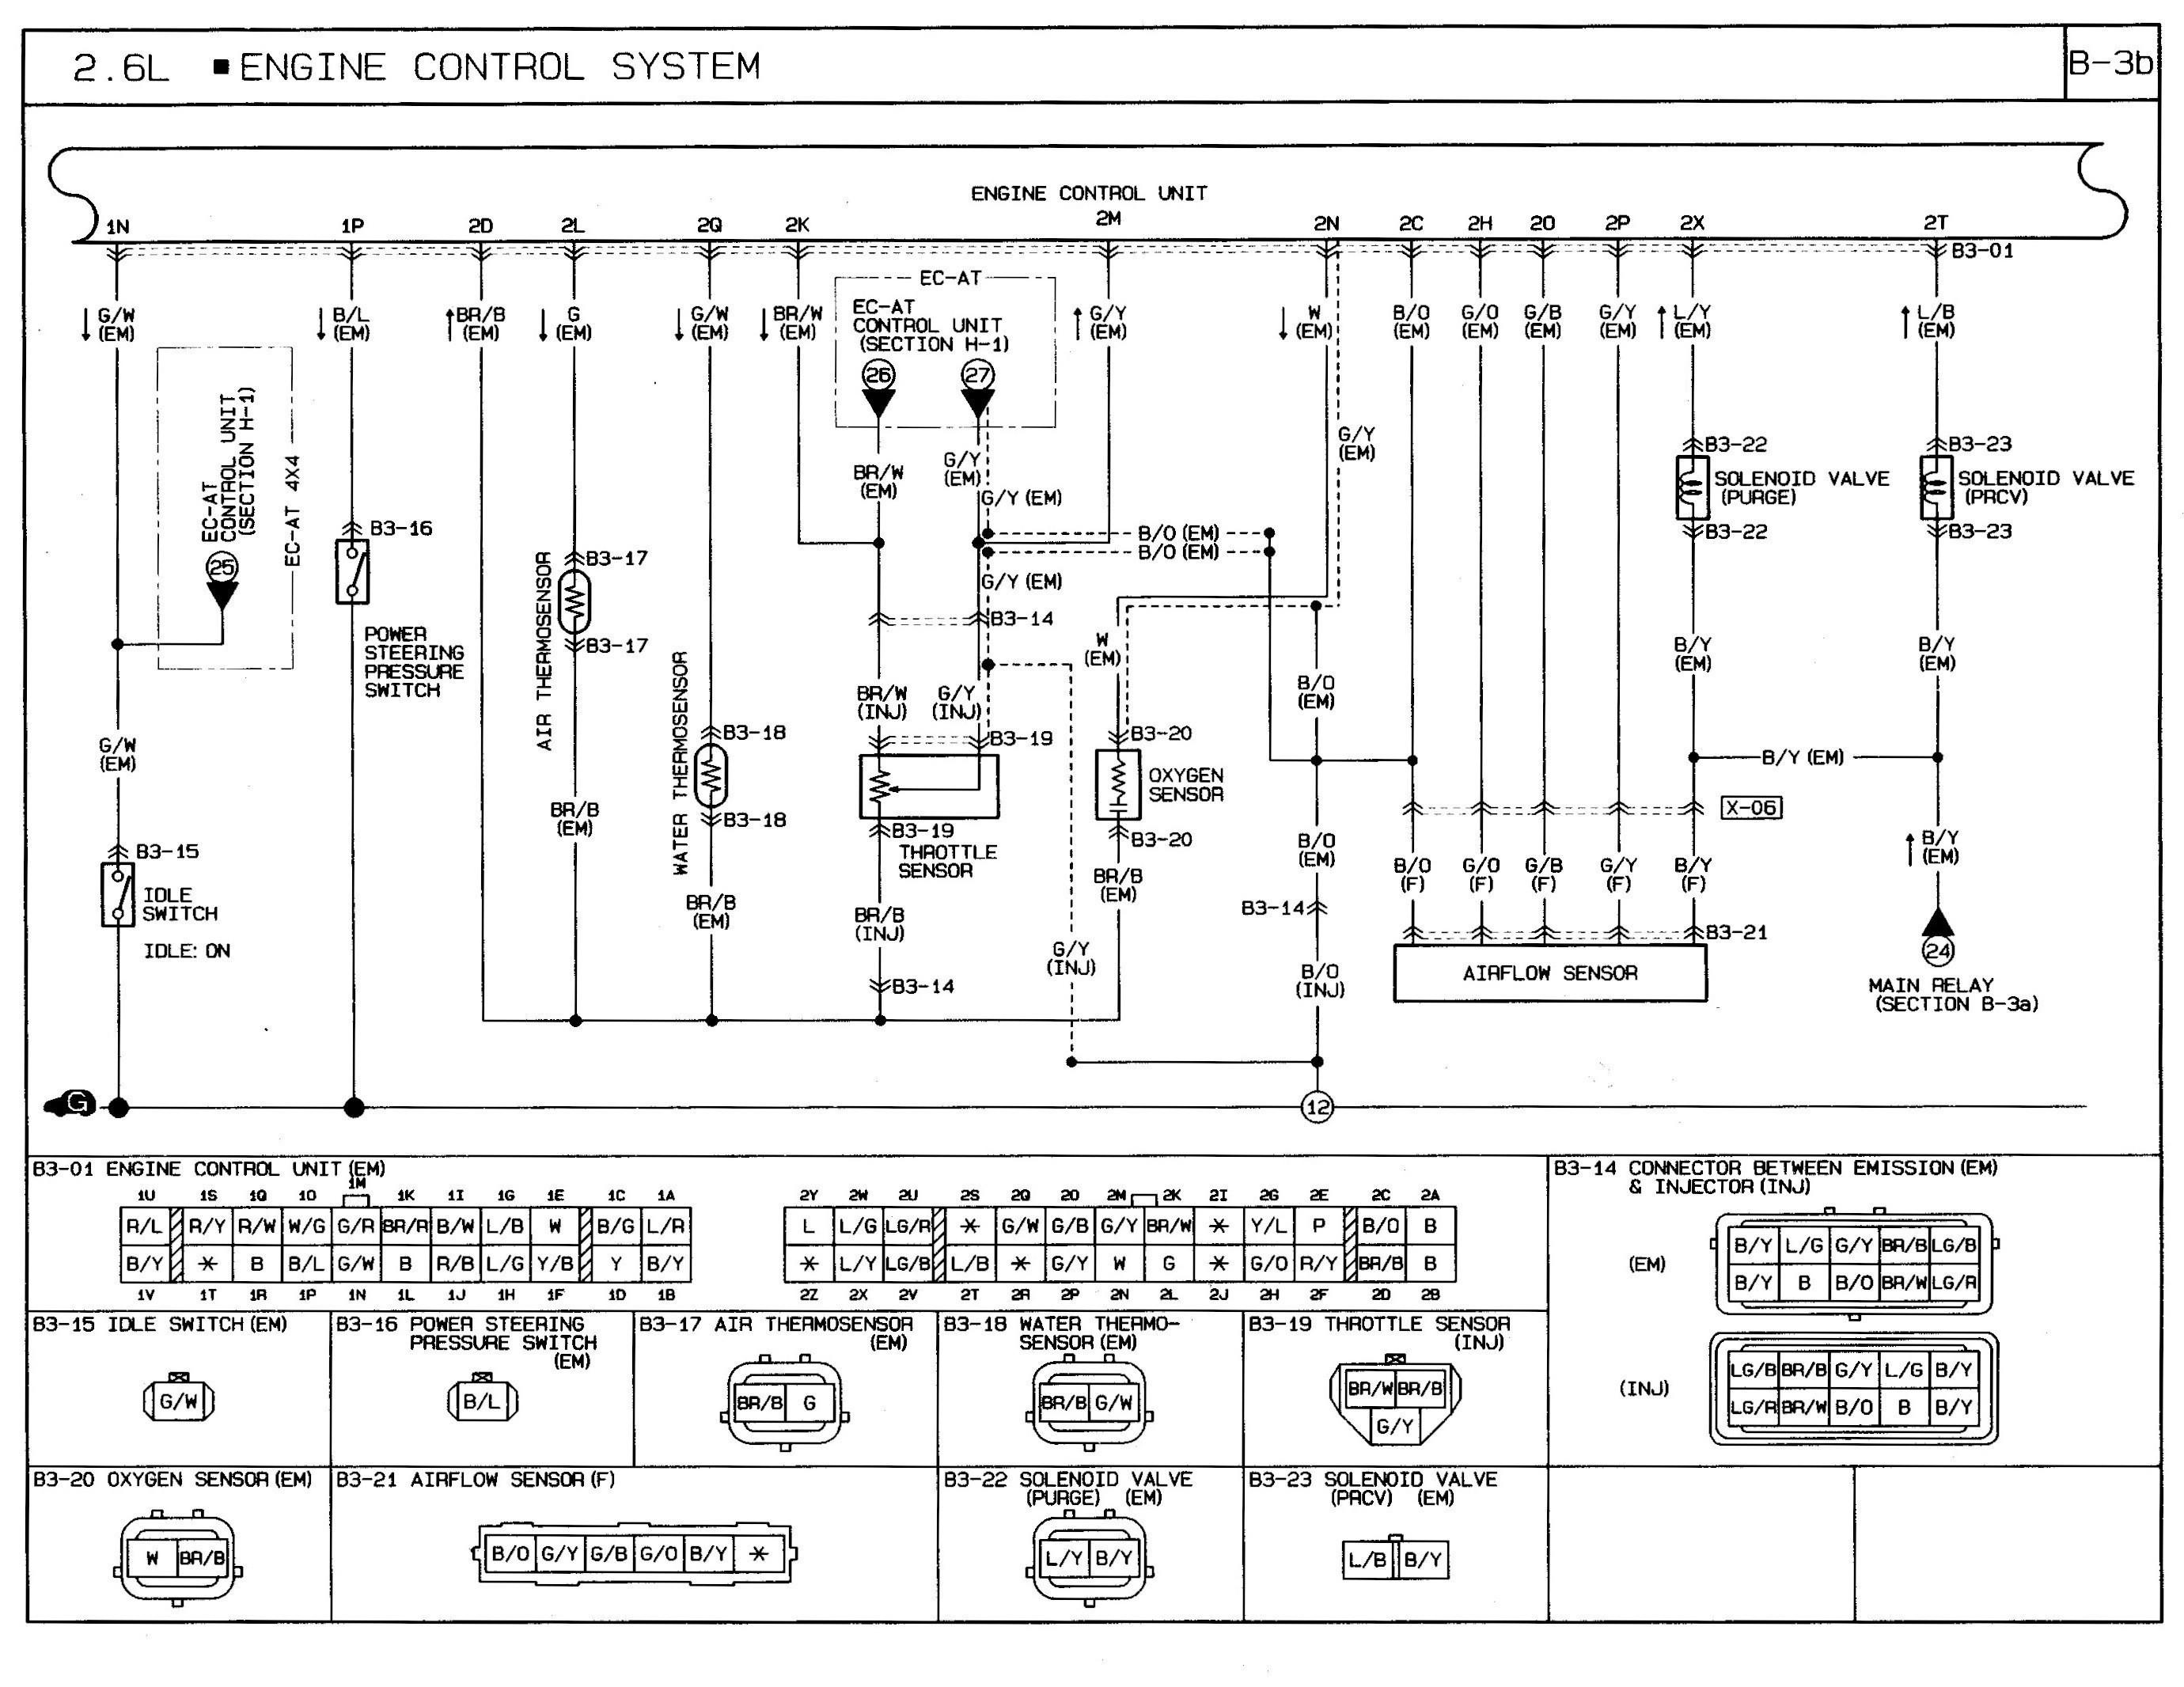 Mazda 6 Engine Parts Diagram 91 Miata Wiring Diagram Experts Wiring Diagram • Of Mazda 6 Engine Parts Diagram